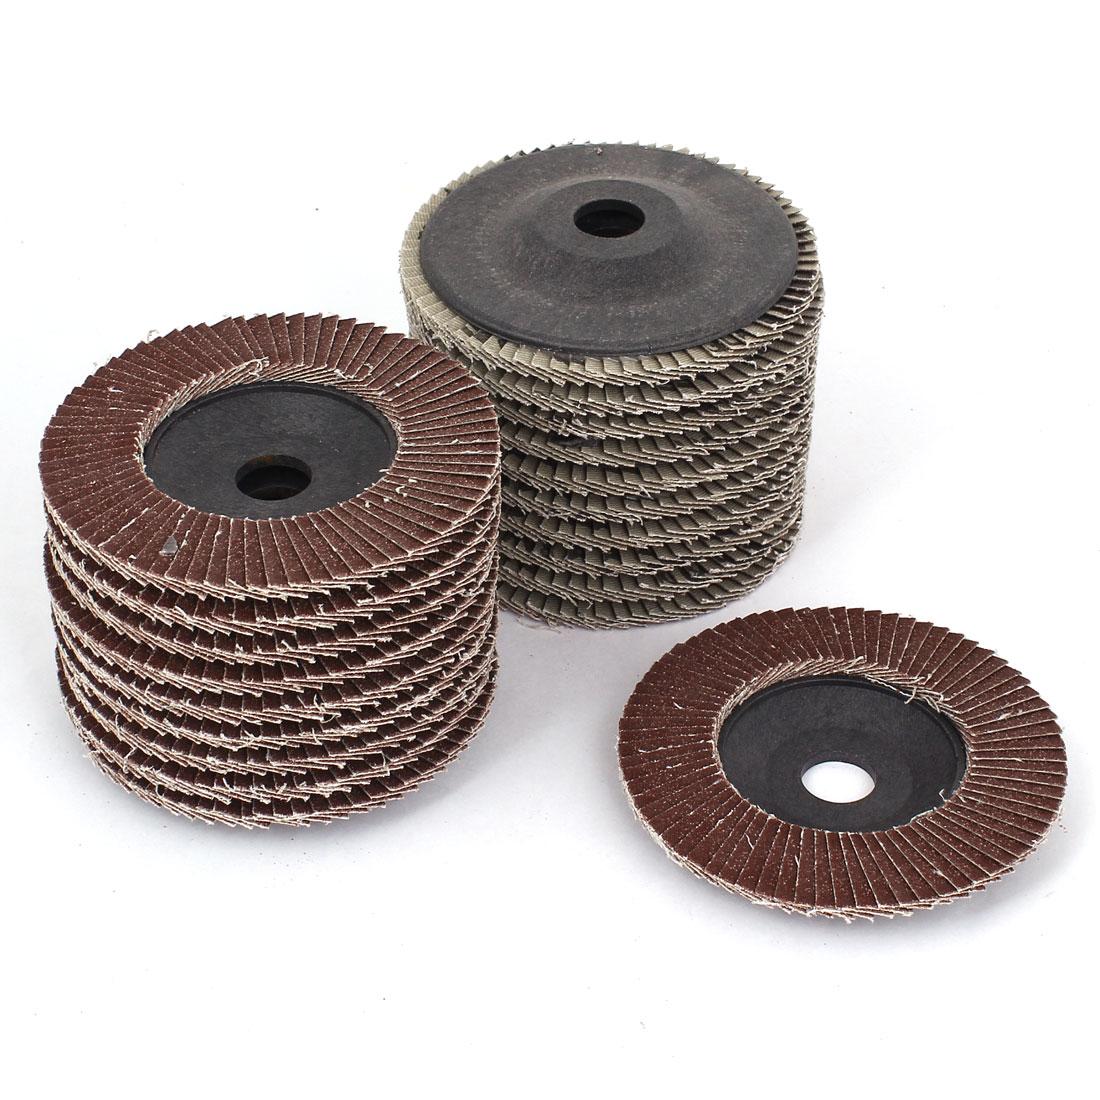 "20pcs 100mm 4"" Dia 16mm Bore 80 Grit Flap Sanding Discs Polishing Buffing Wheels"